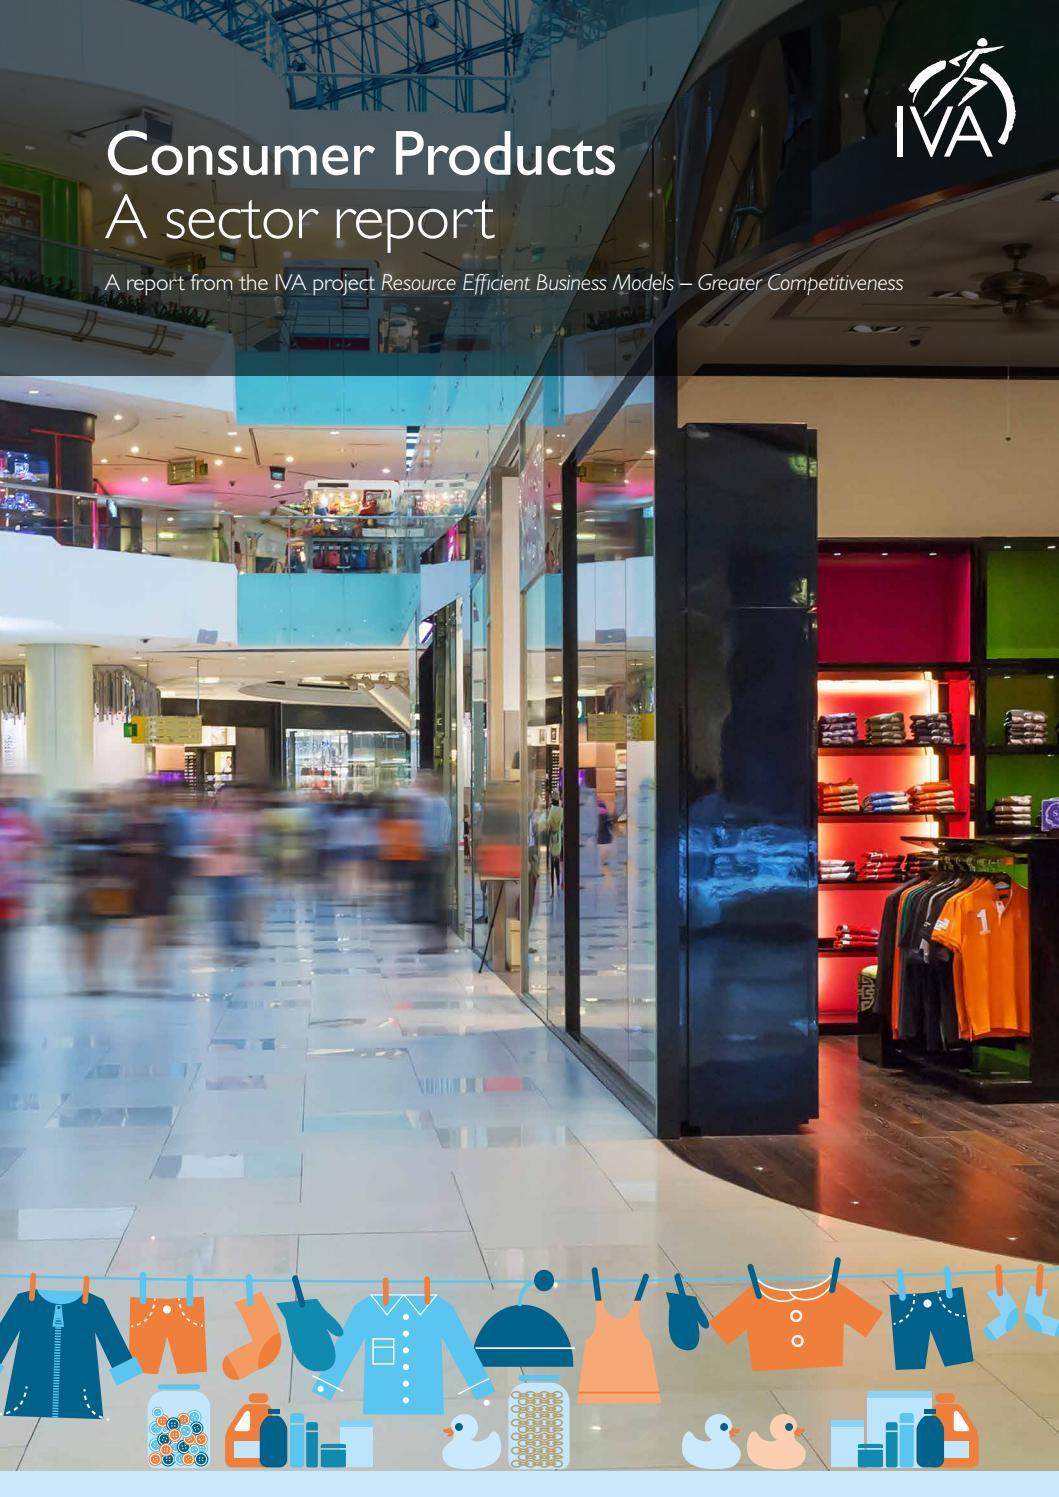 Consumer Products A Sector Report English By Kungl Ingenjorsvetenskapsakademien Iva Issuu